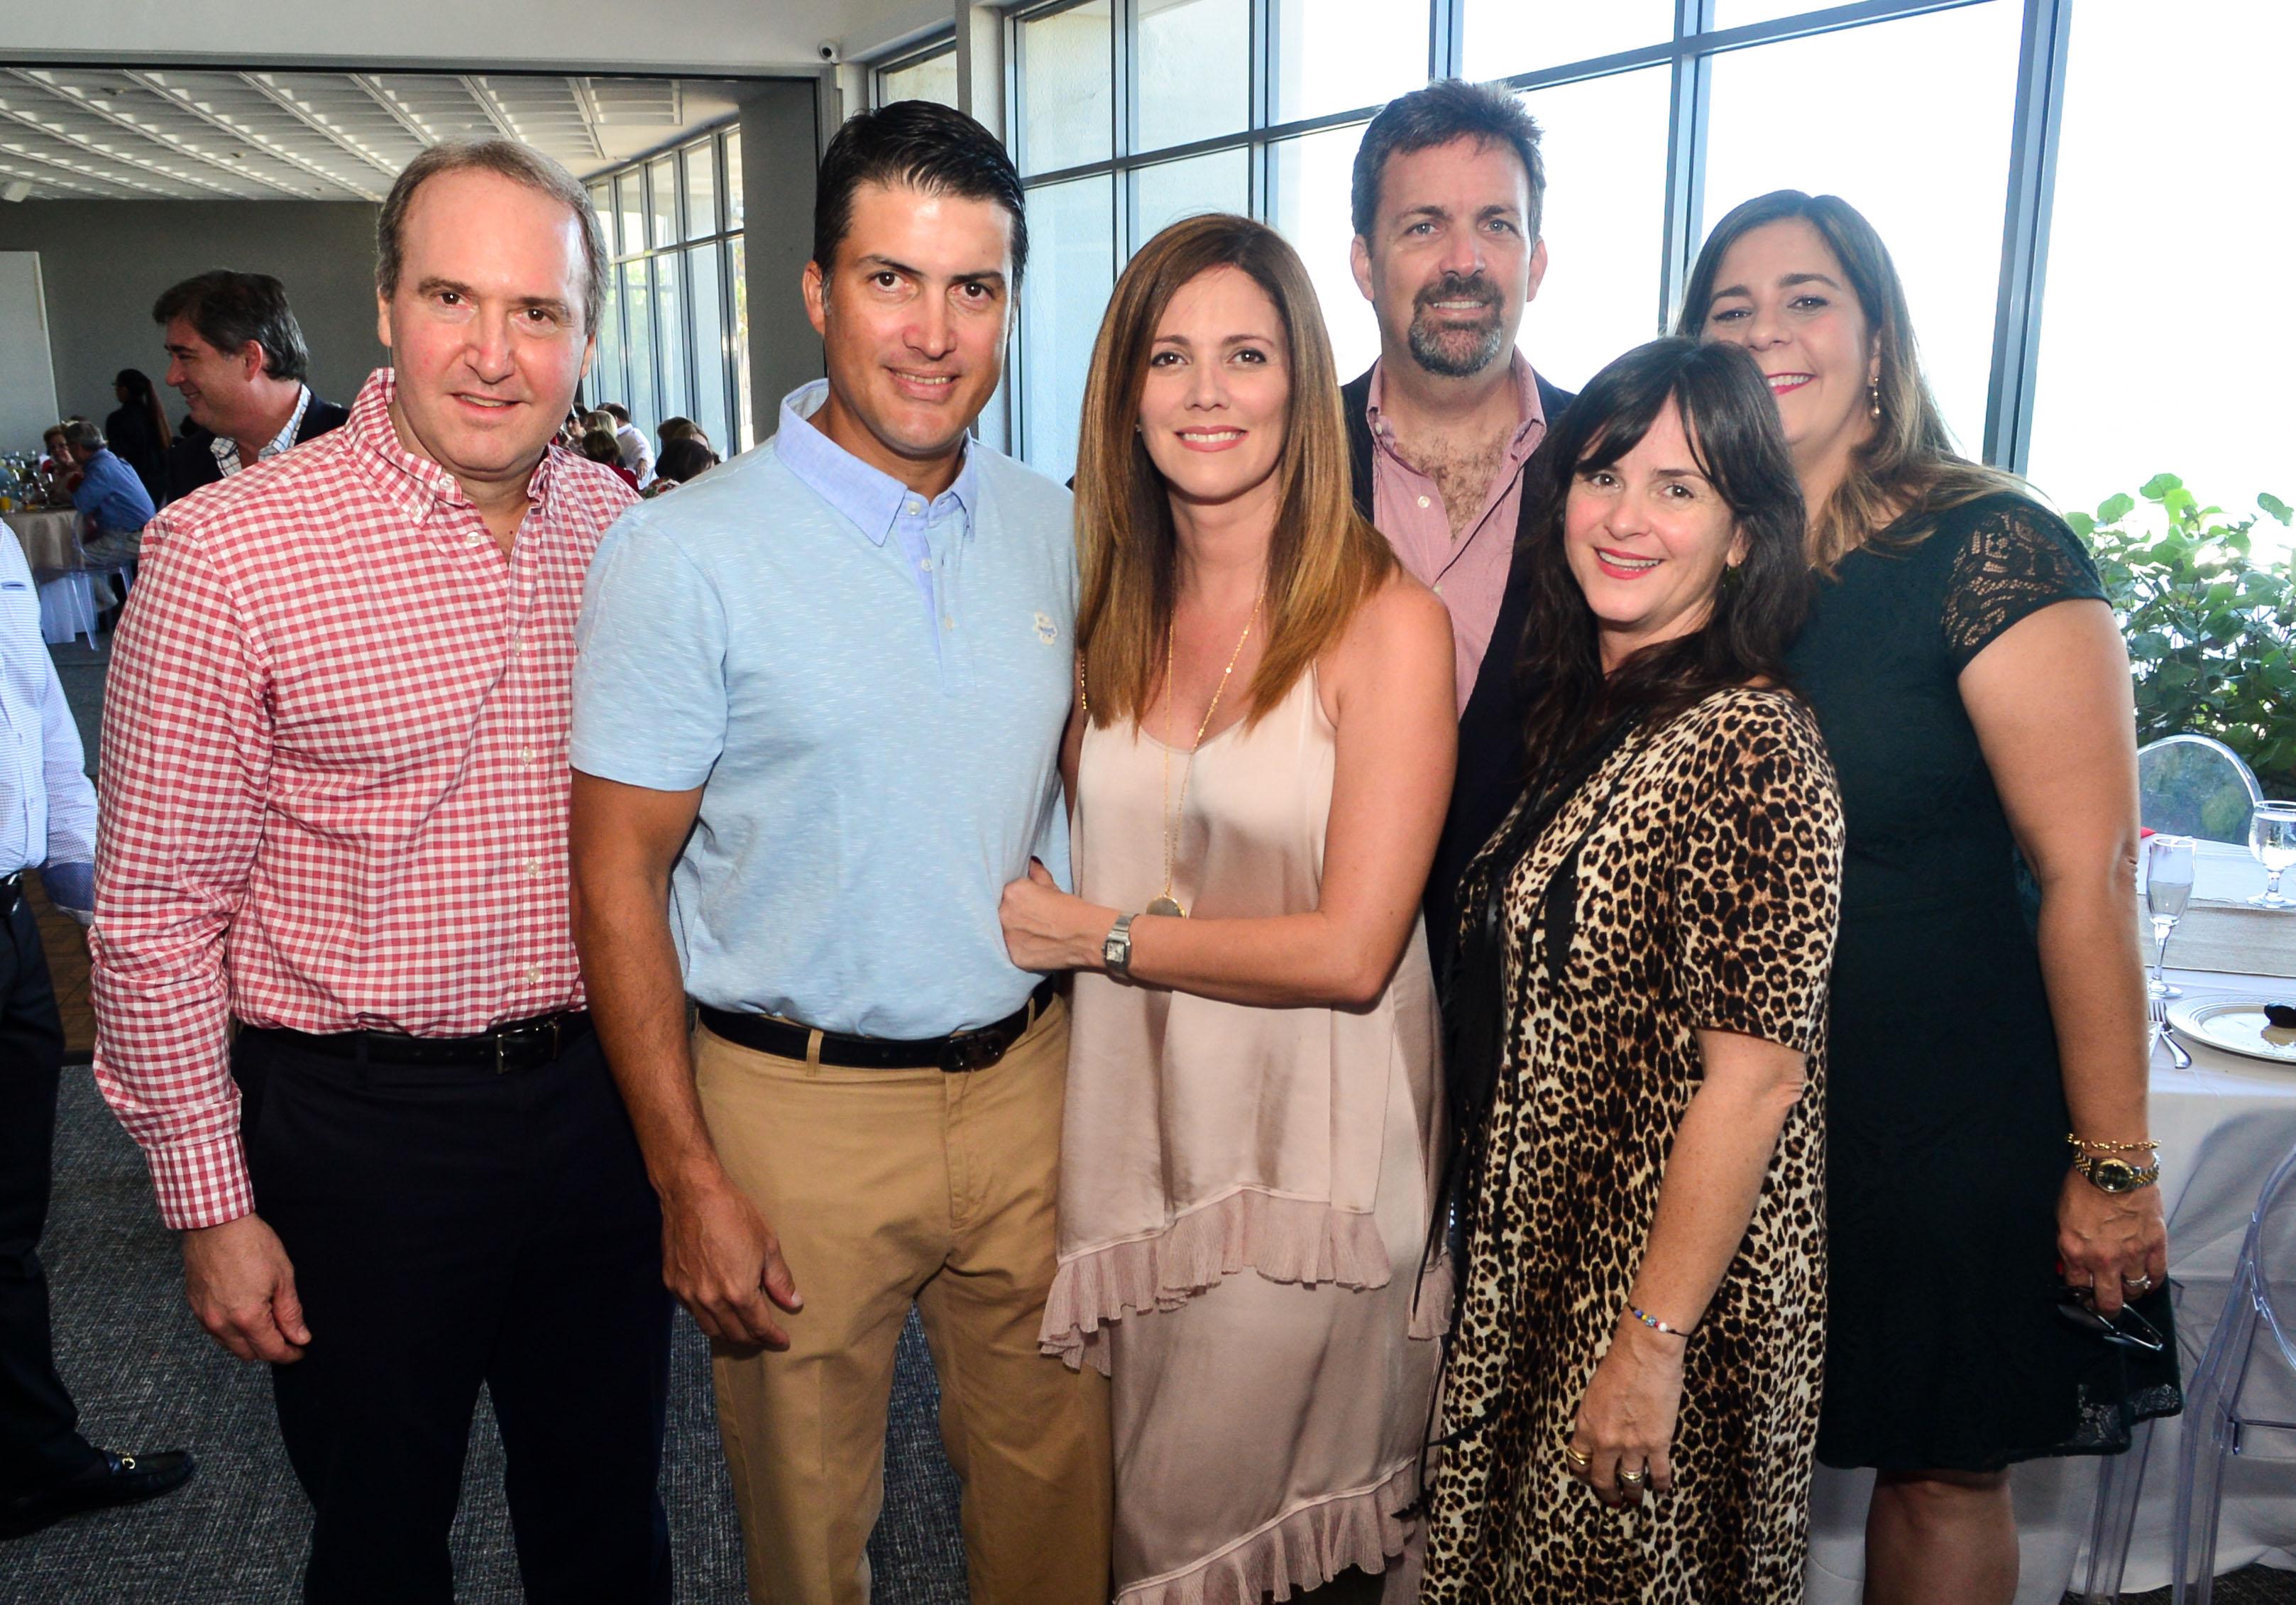 Jorge Jiménez, Alfredo Santaella, Máximo Blondet, Elba Arroyo, Javier Calderón, Glenis Castro y Ana Bobonis. Foto Enid M. Salgado Mercado.